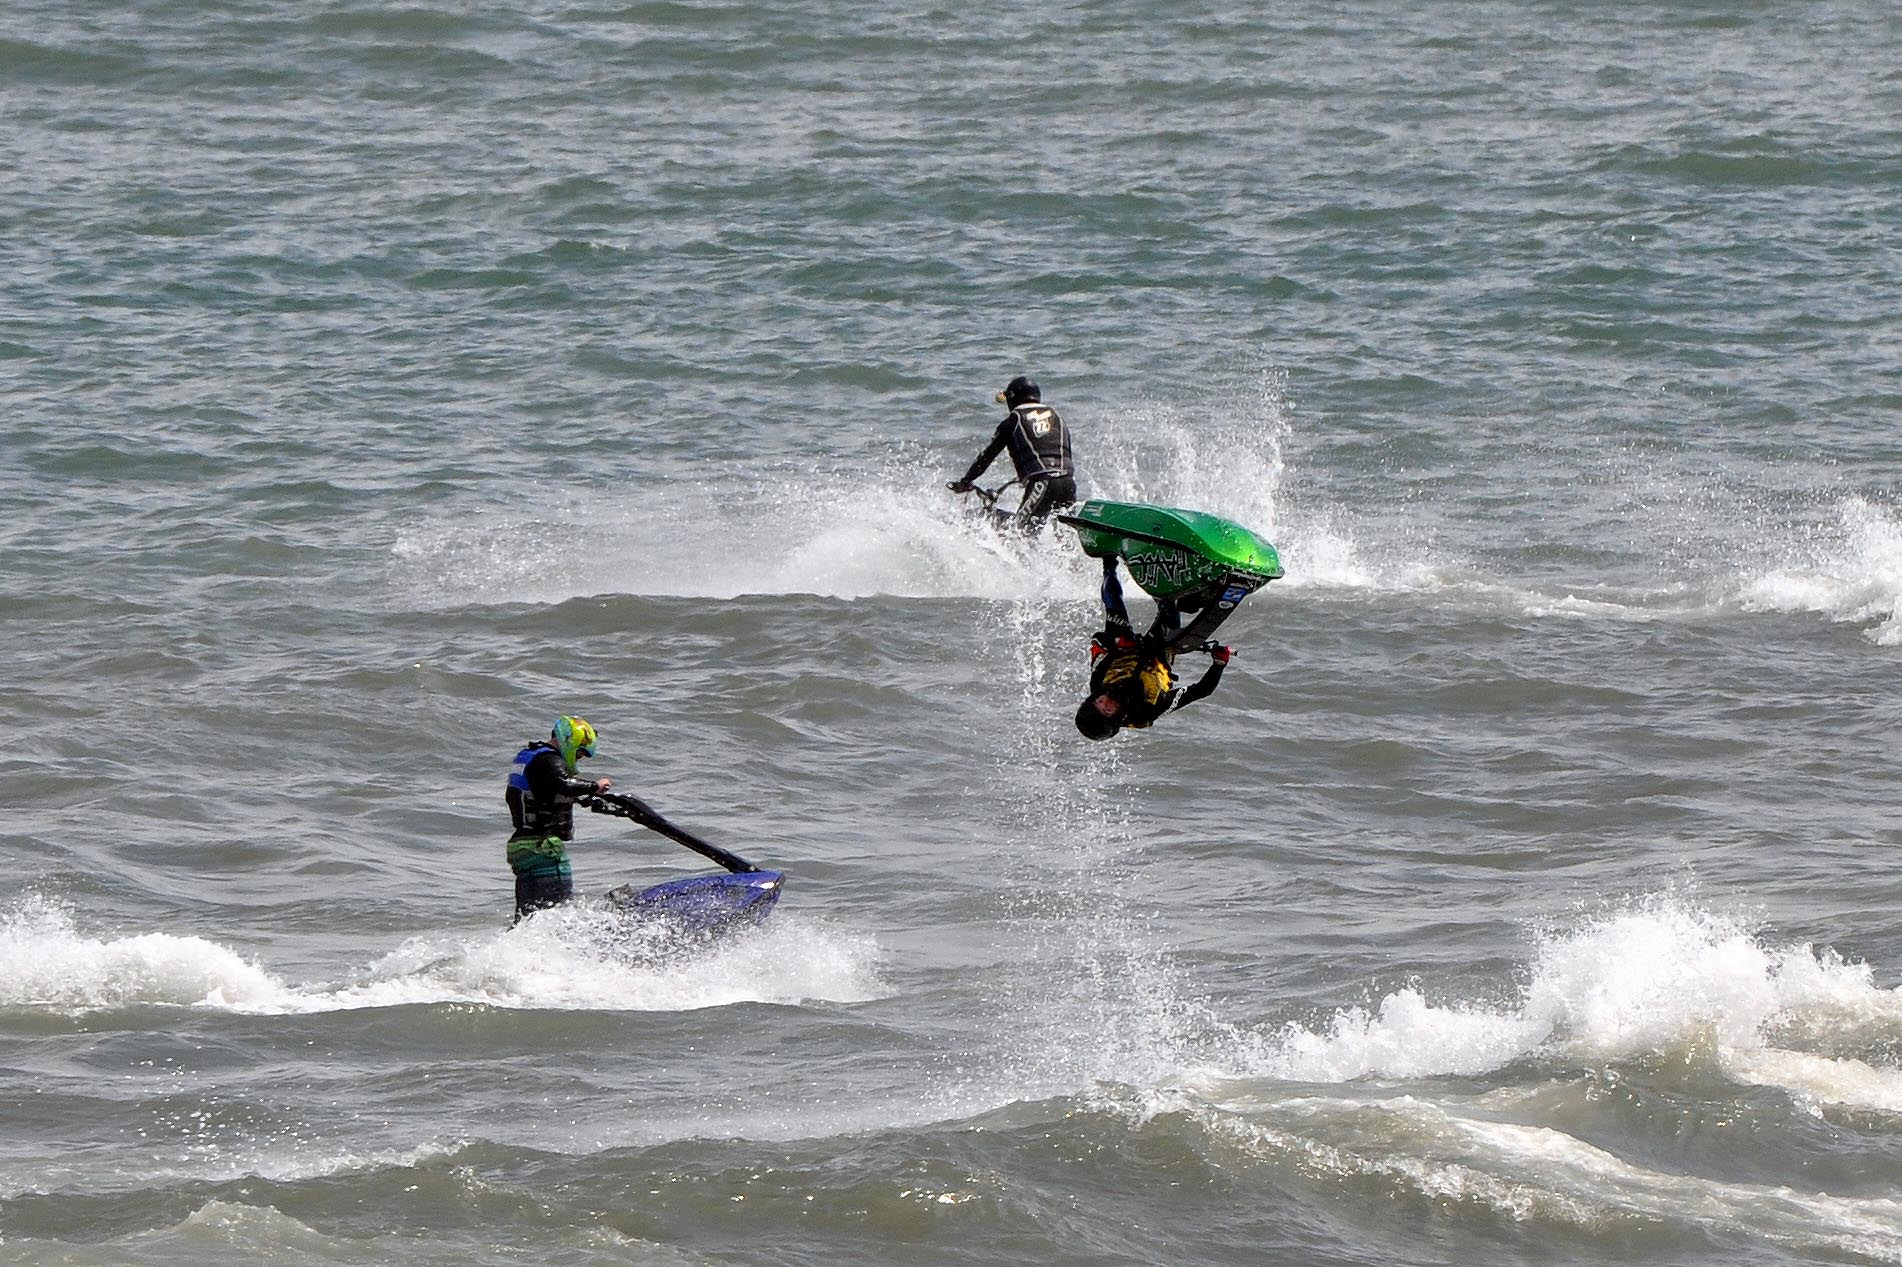 WaveDaze in Virginia Beach